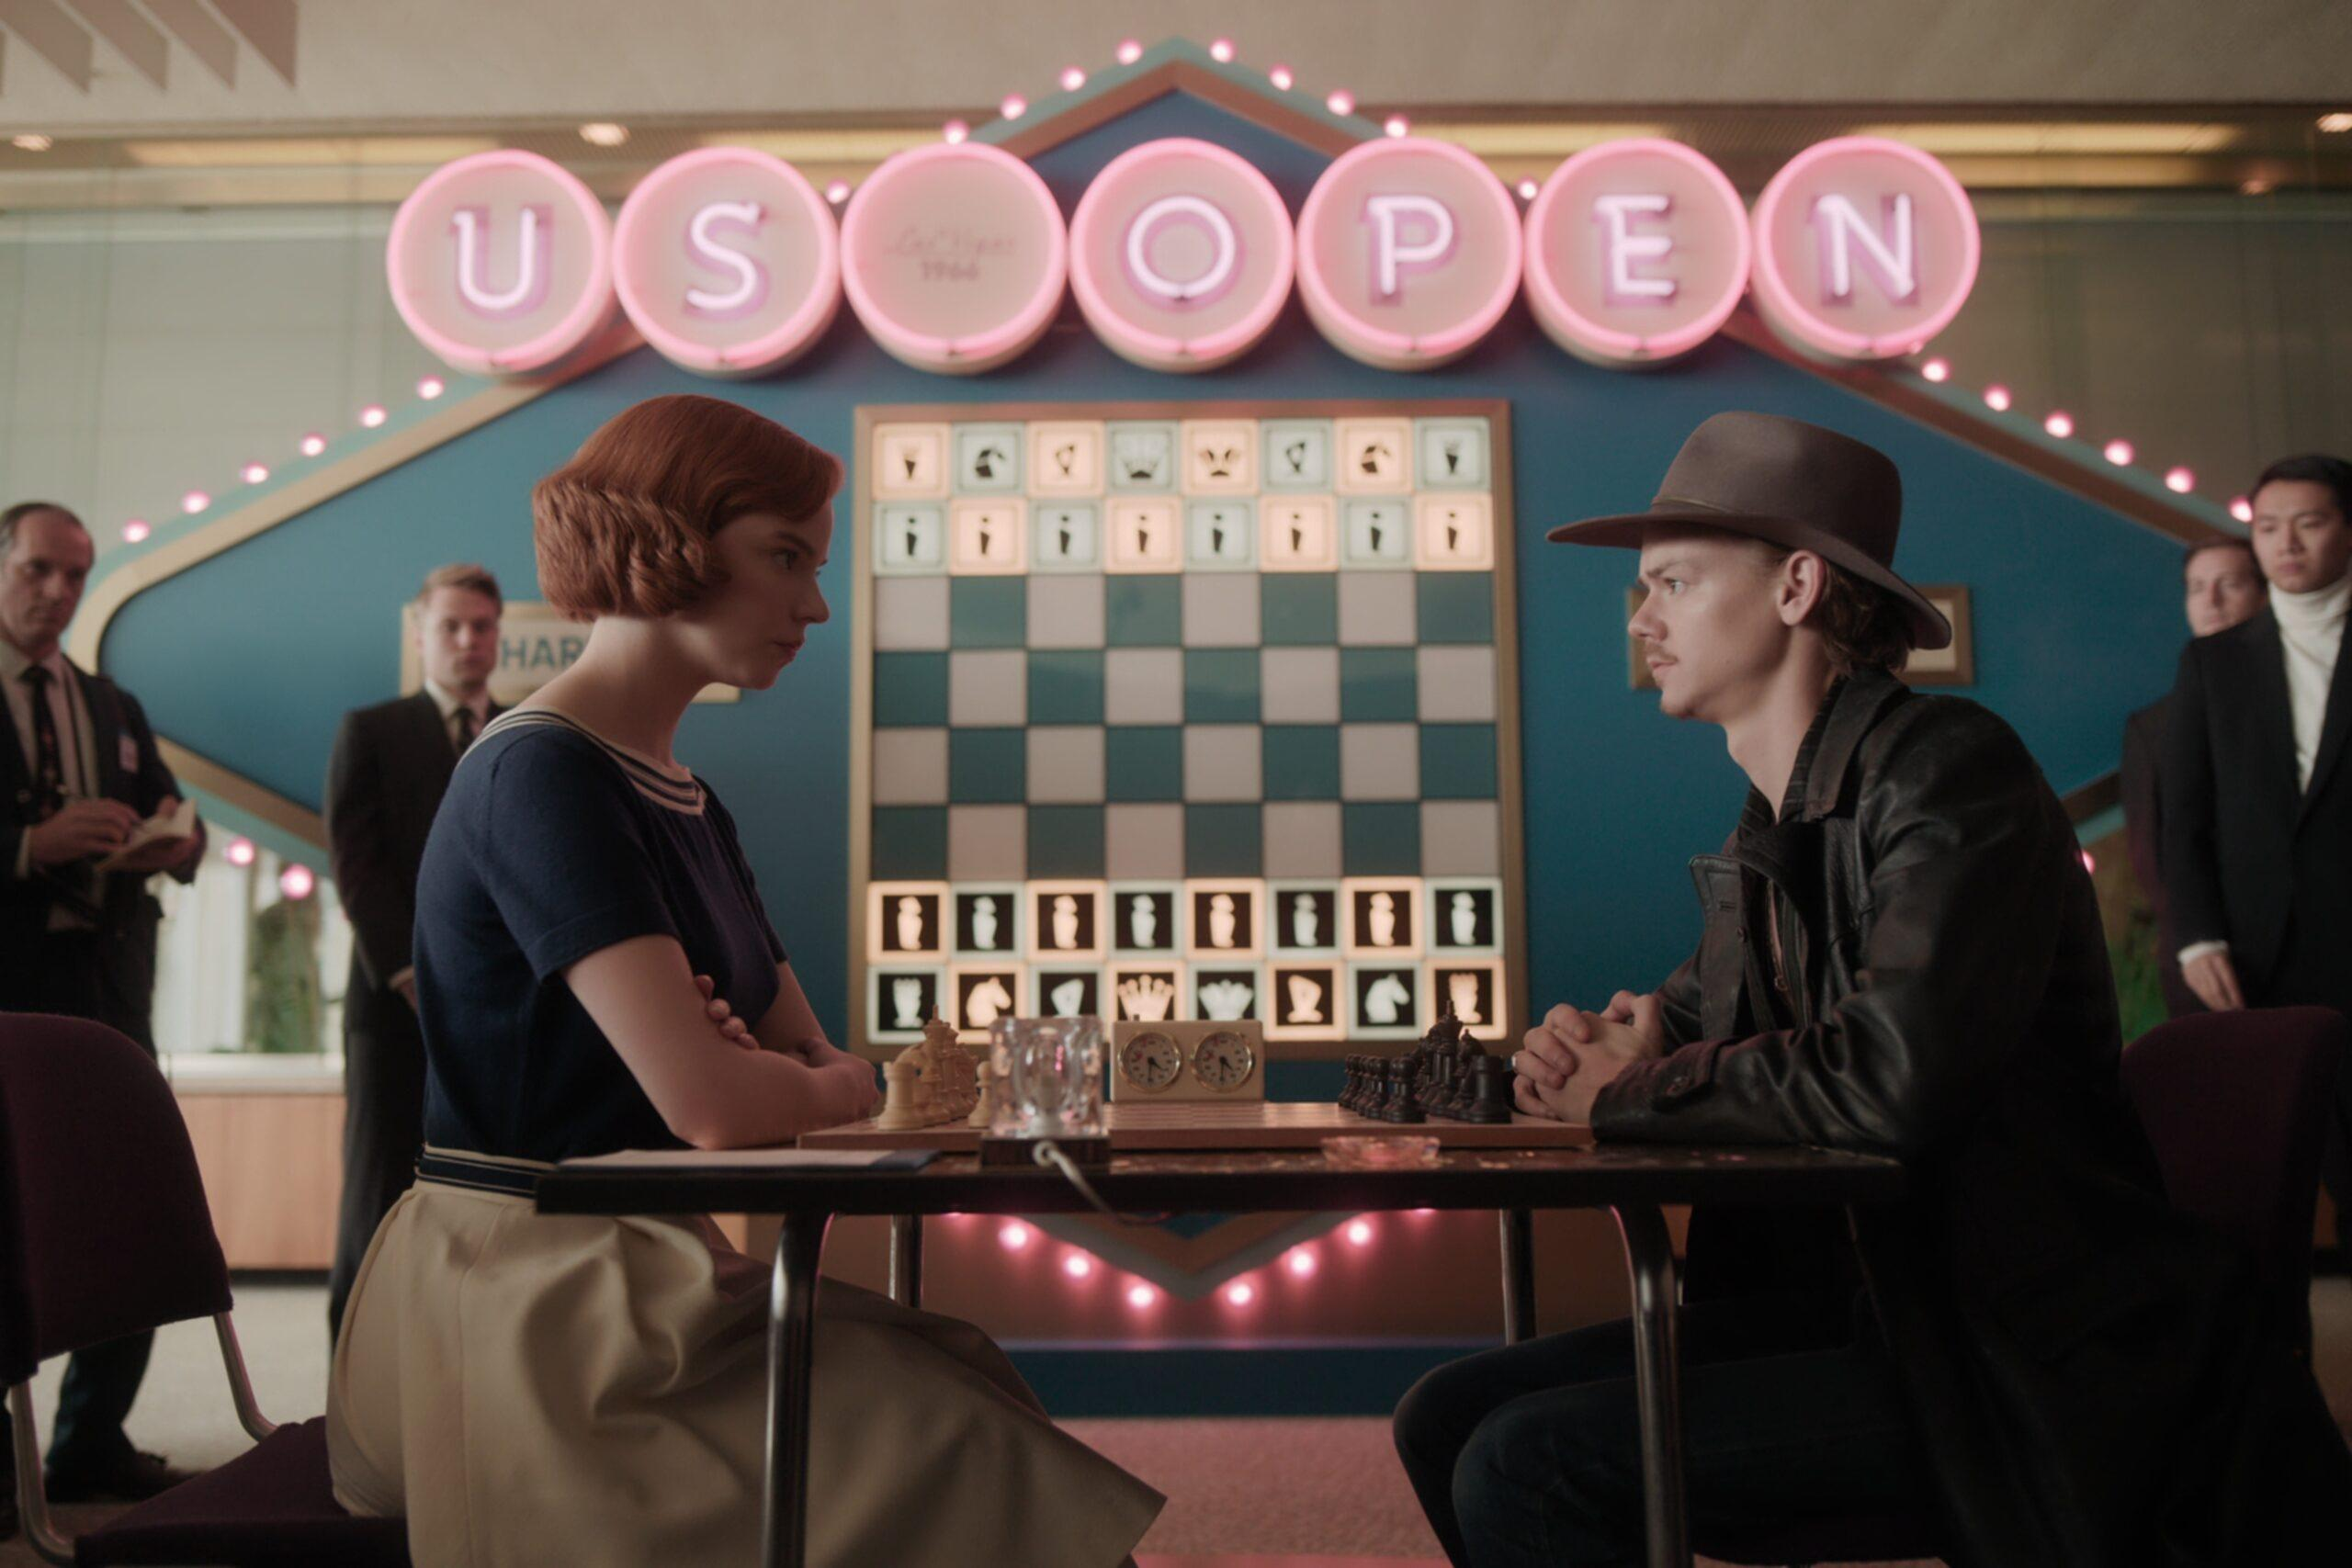 O gambito da rainha xadrez online